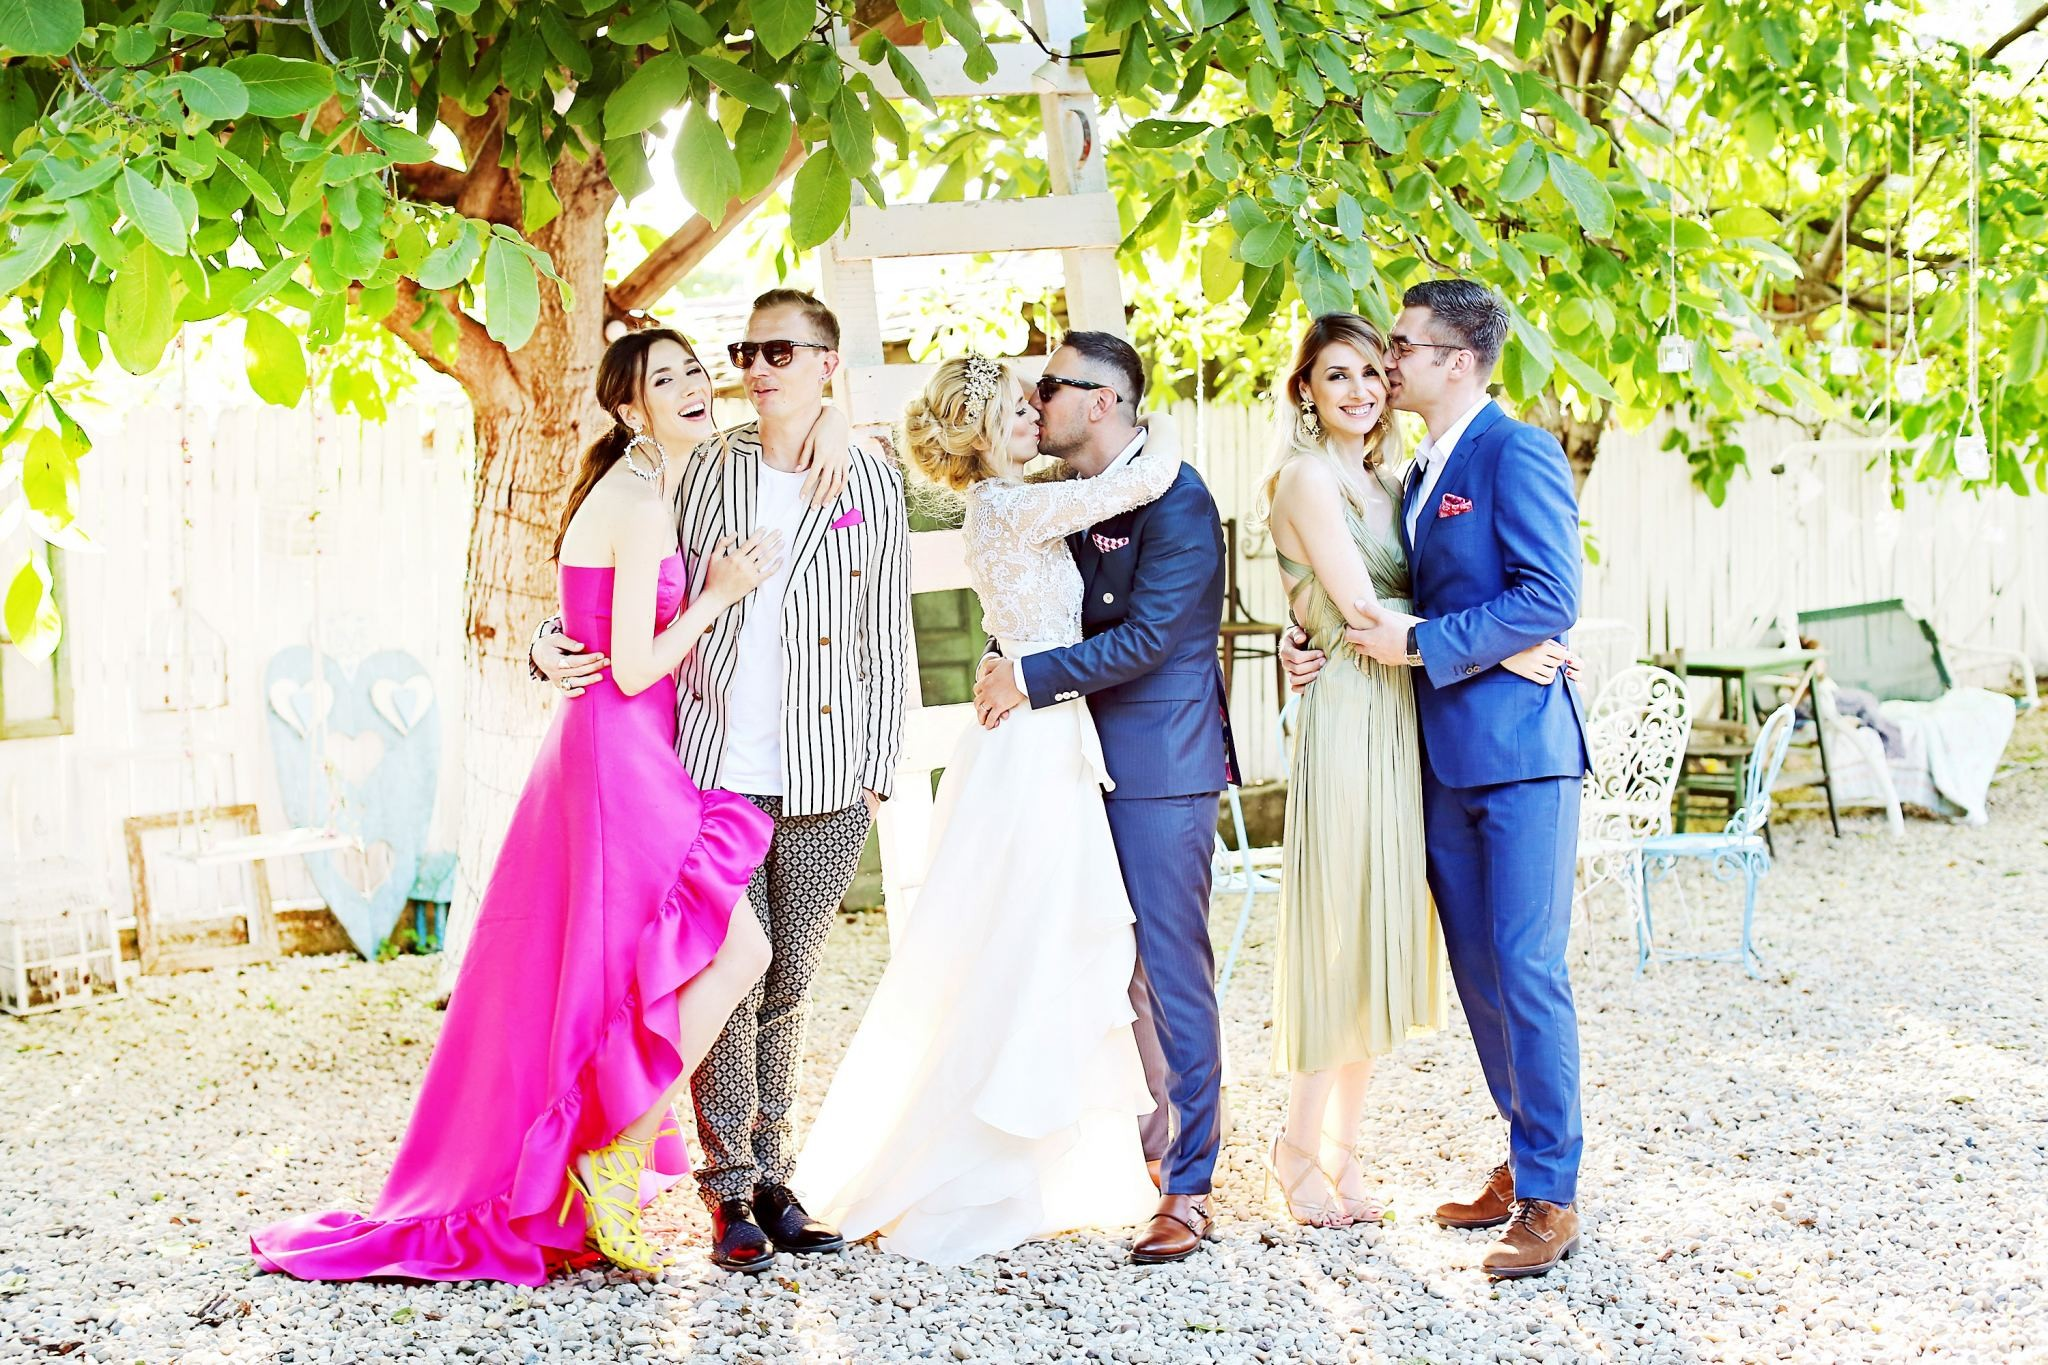 16Fabuloasasemarita_alina_tanasa_diana_enciu_fabulous_muses_blogger_wedding_famous wedding_nunta2016